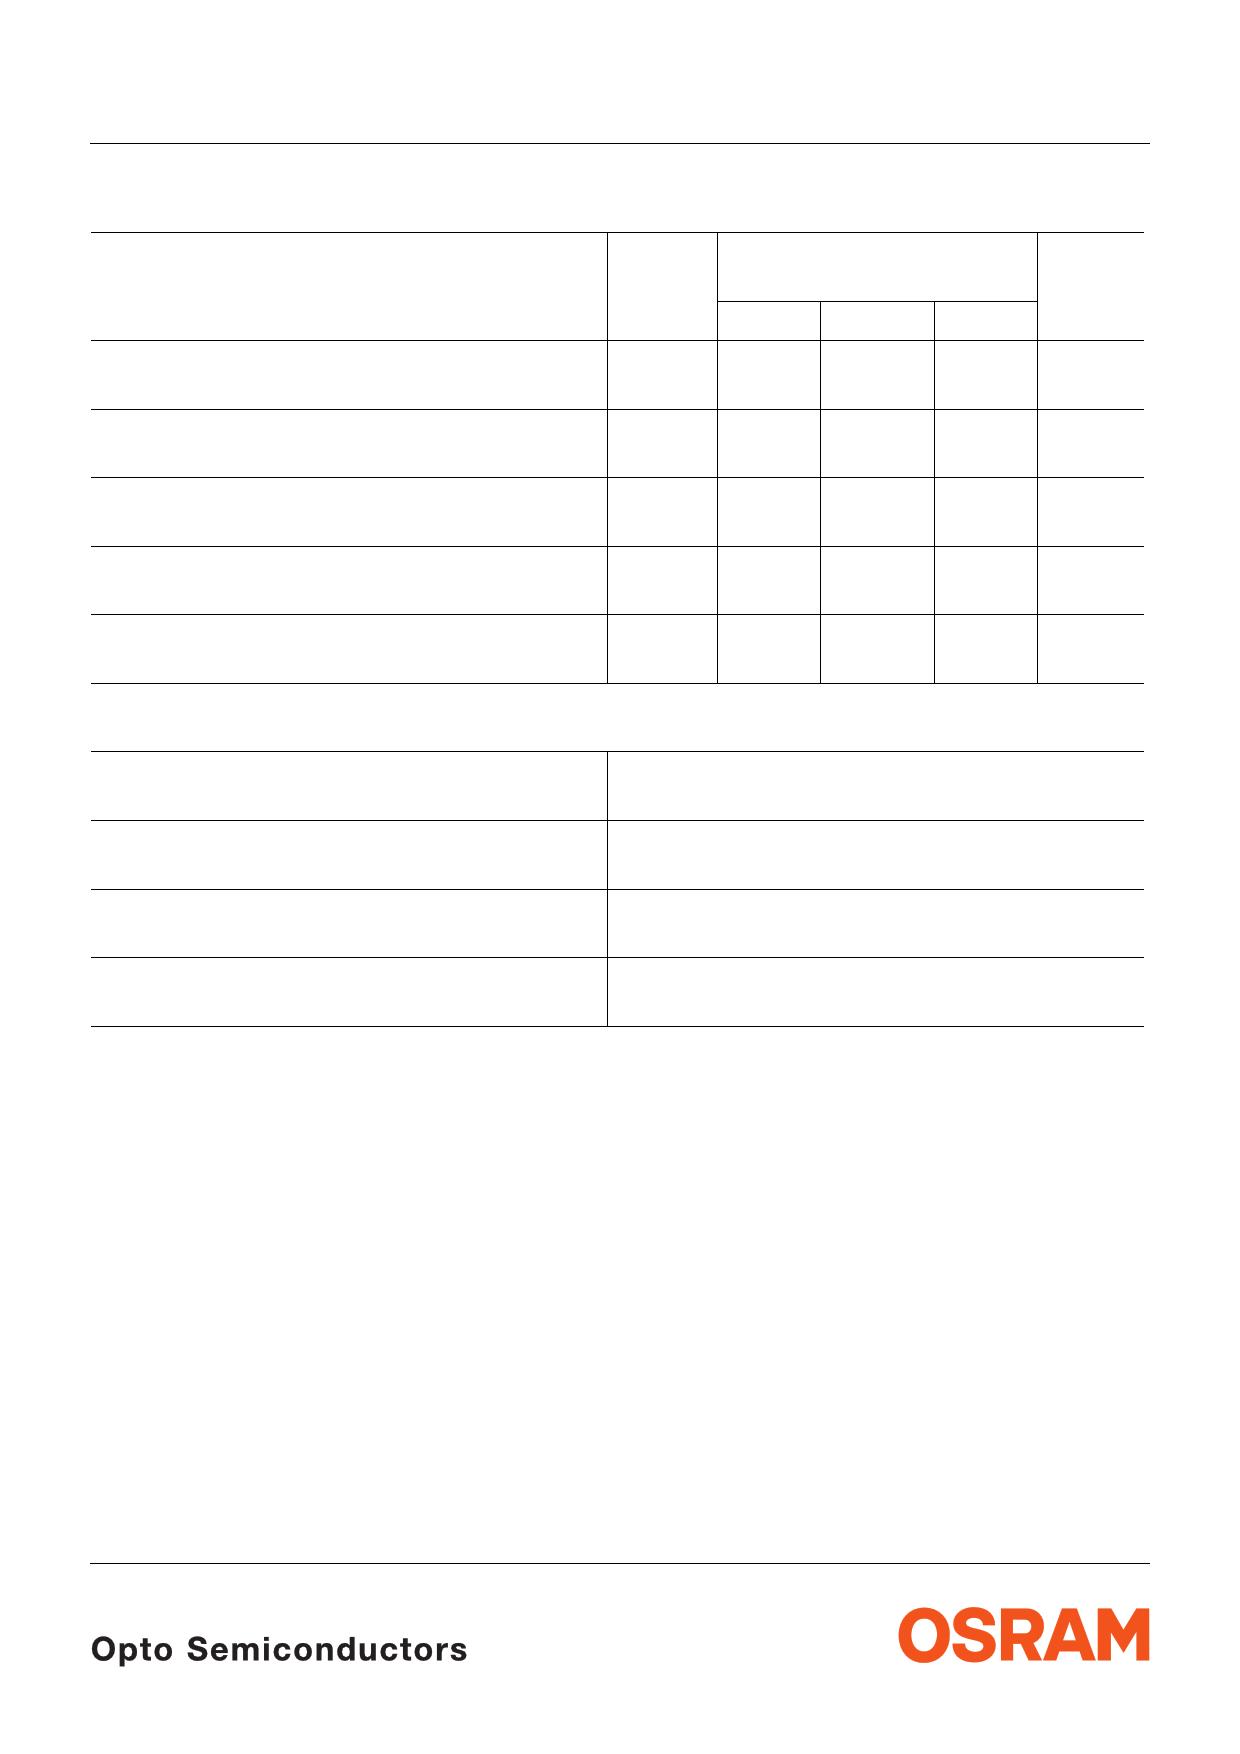 F0118G Даташит, Описание, Даташиты